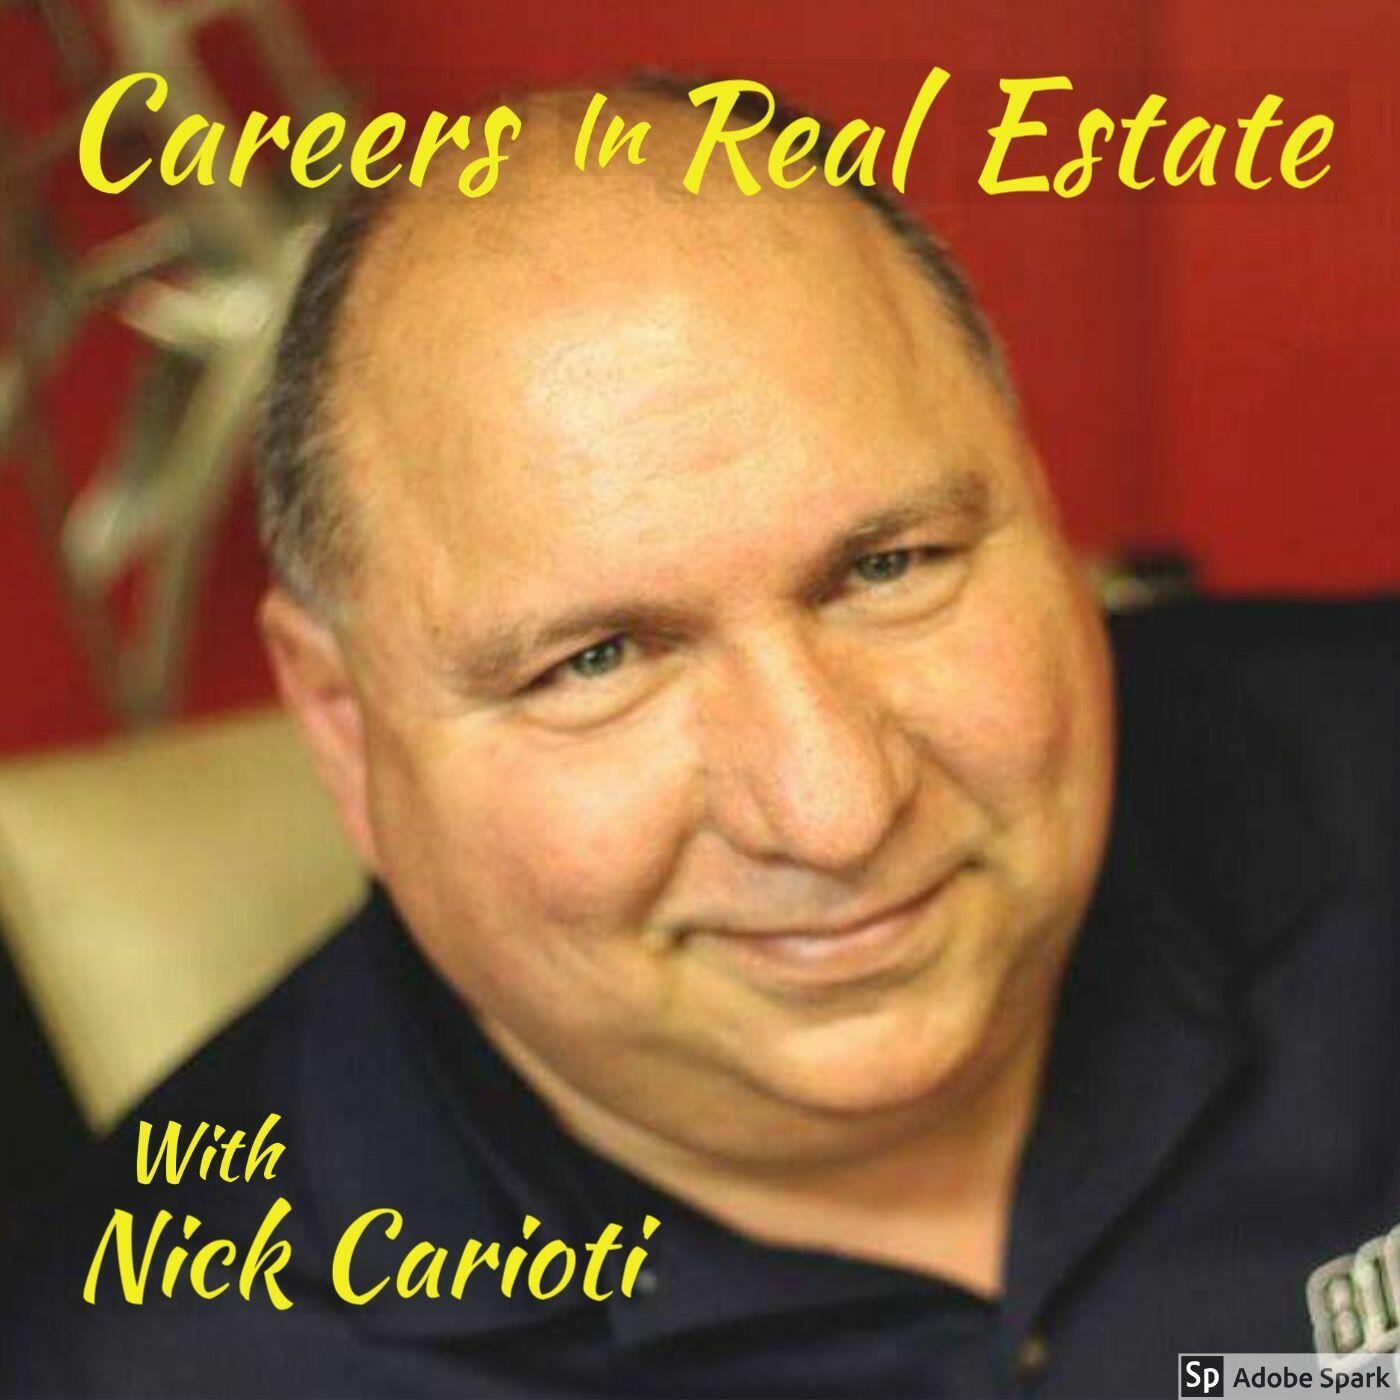 Careers In Real Estate